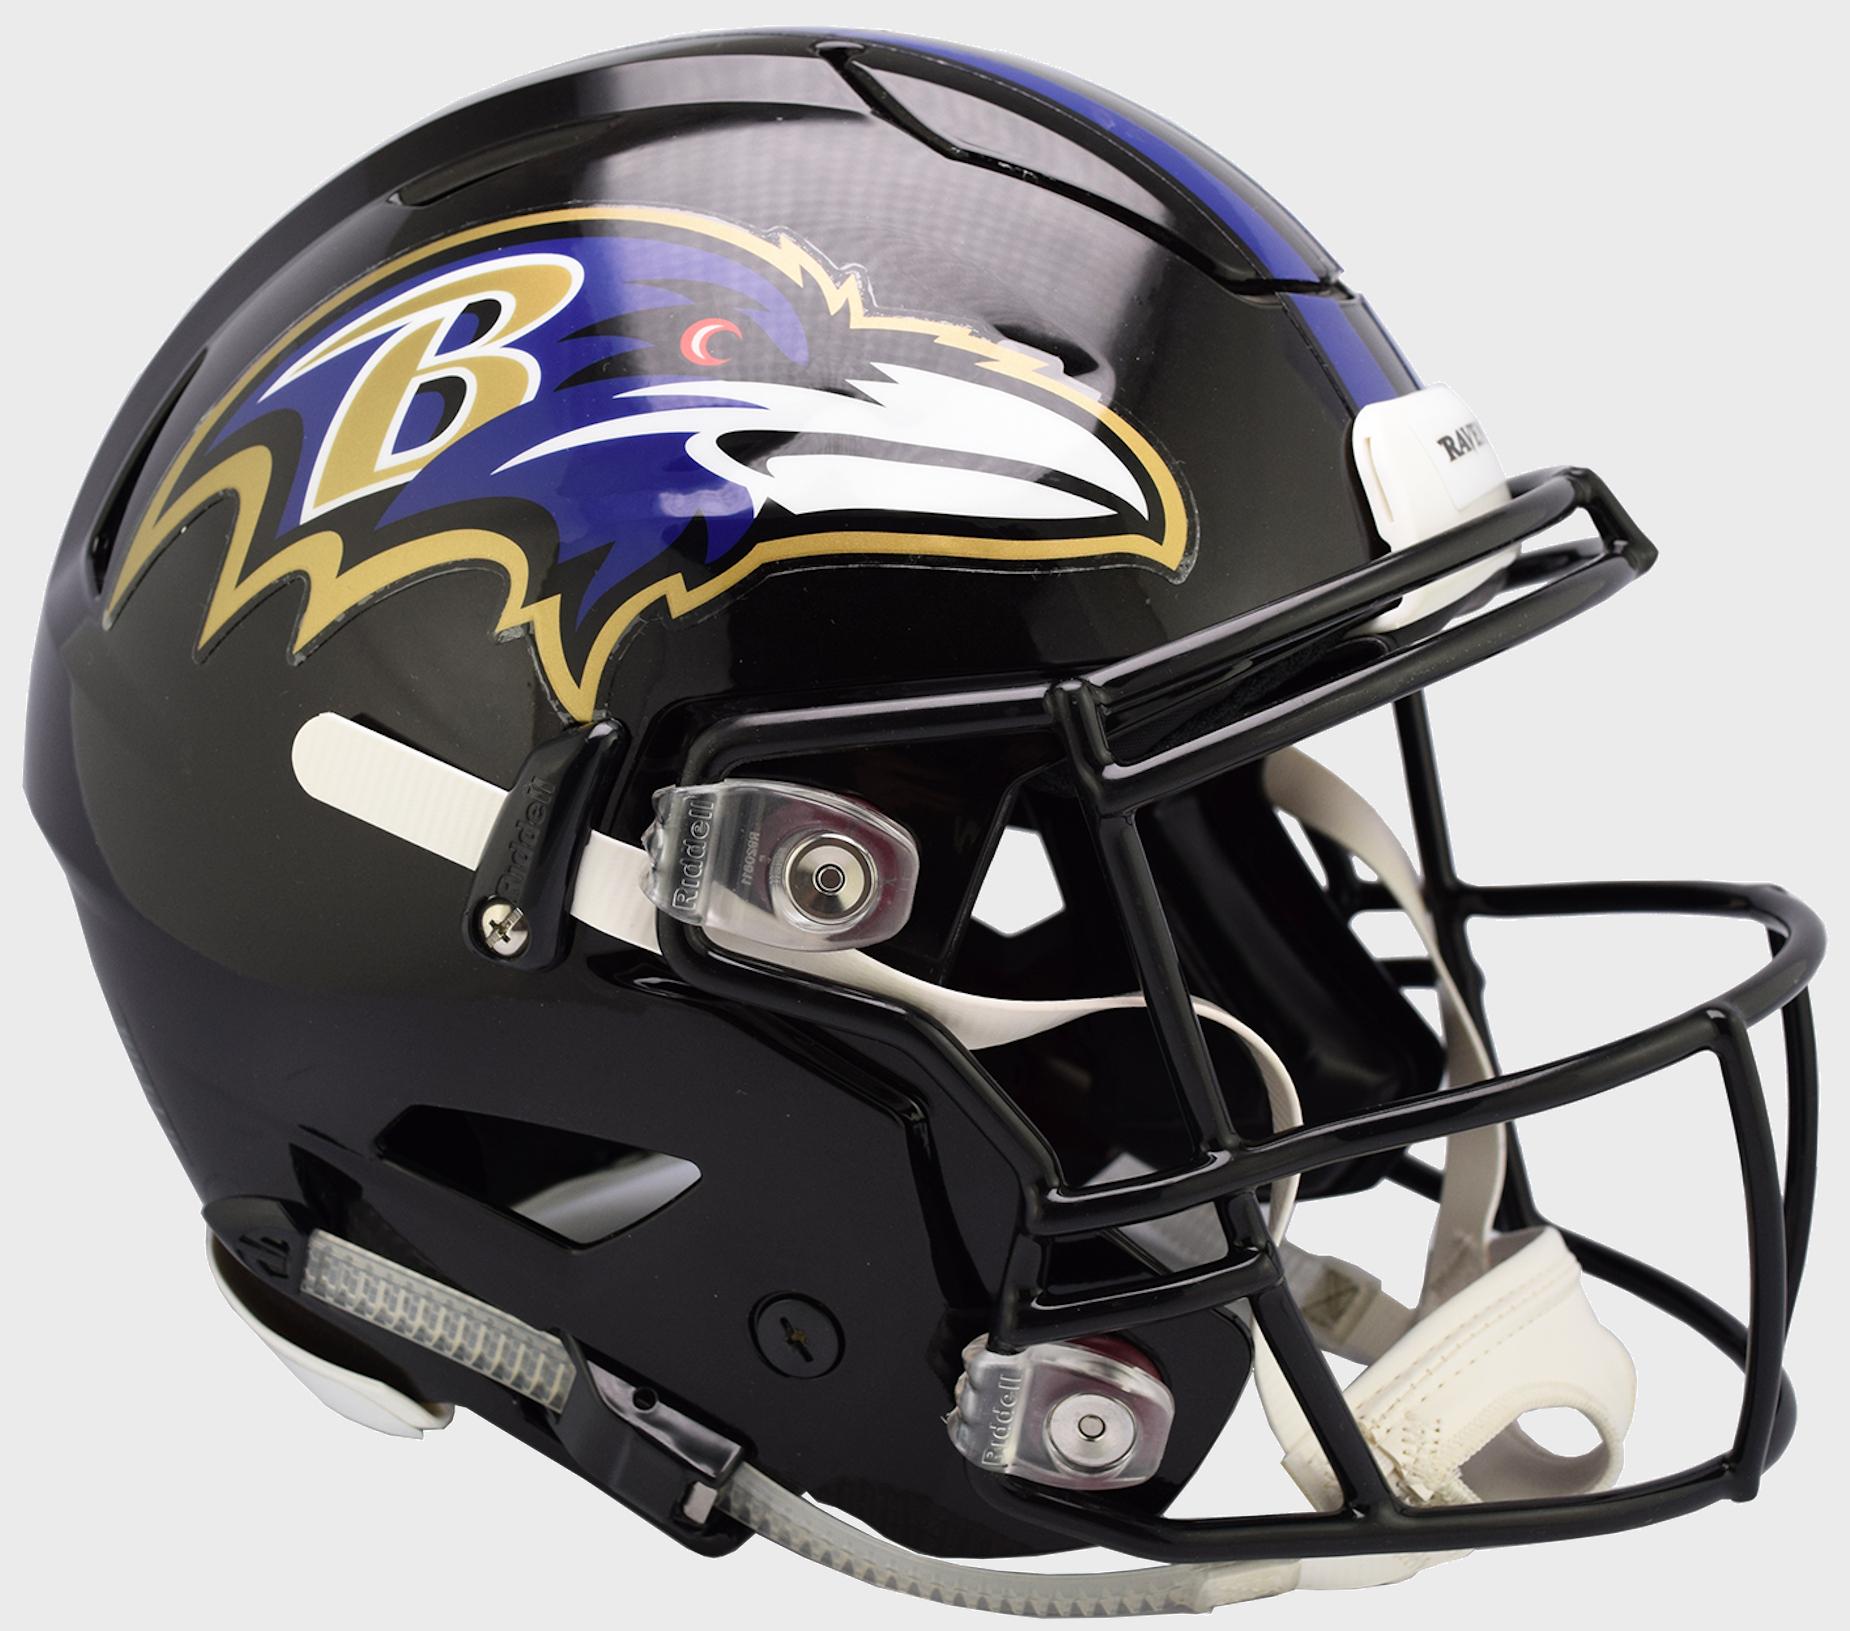 Baltimore Ravens SpeedFlex Football Helmet.